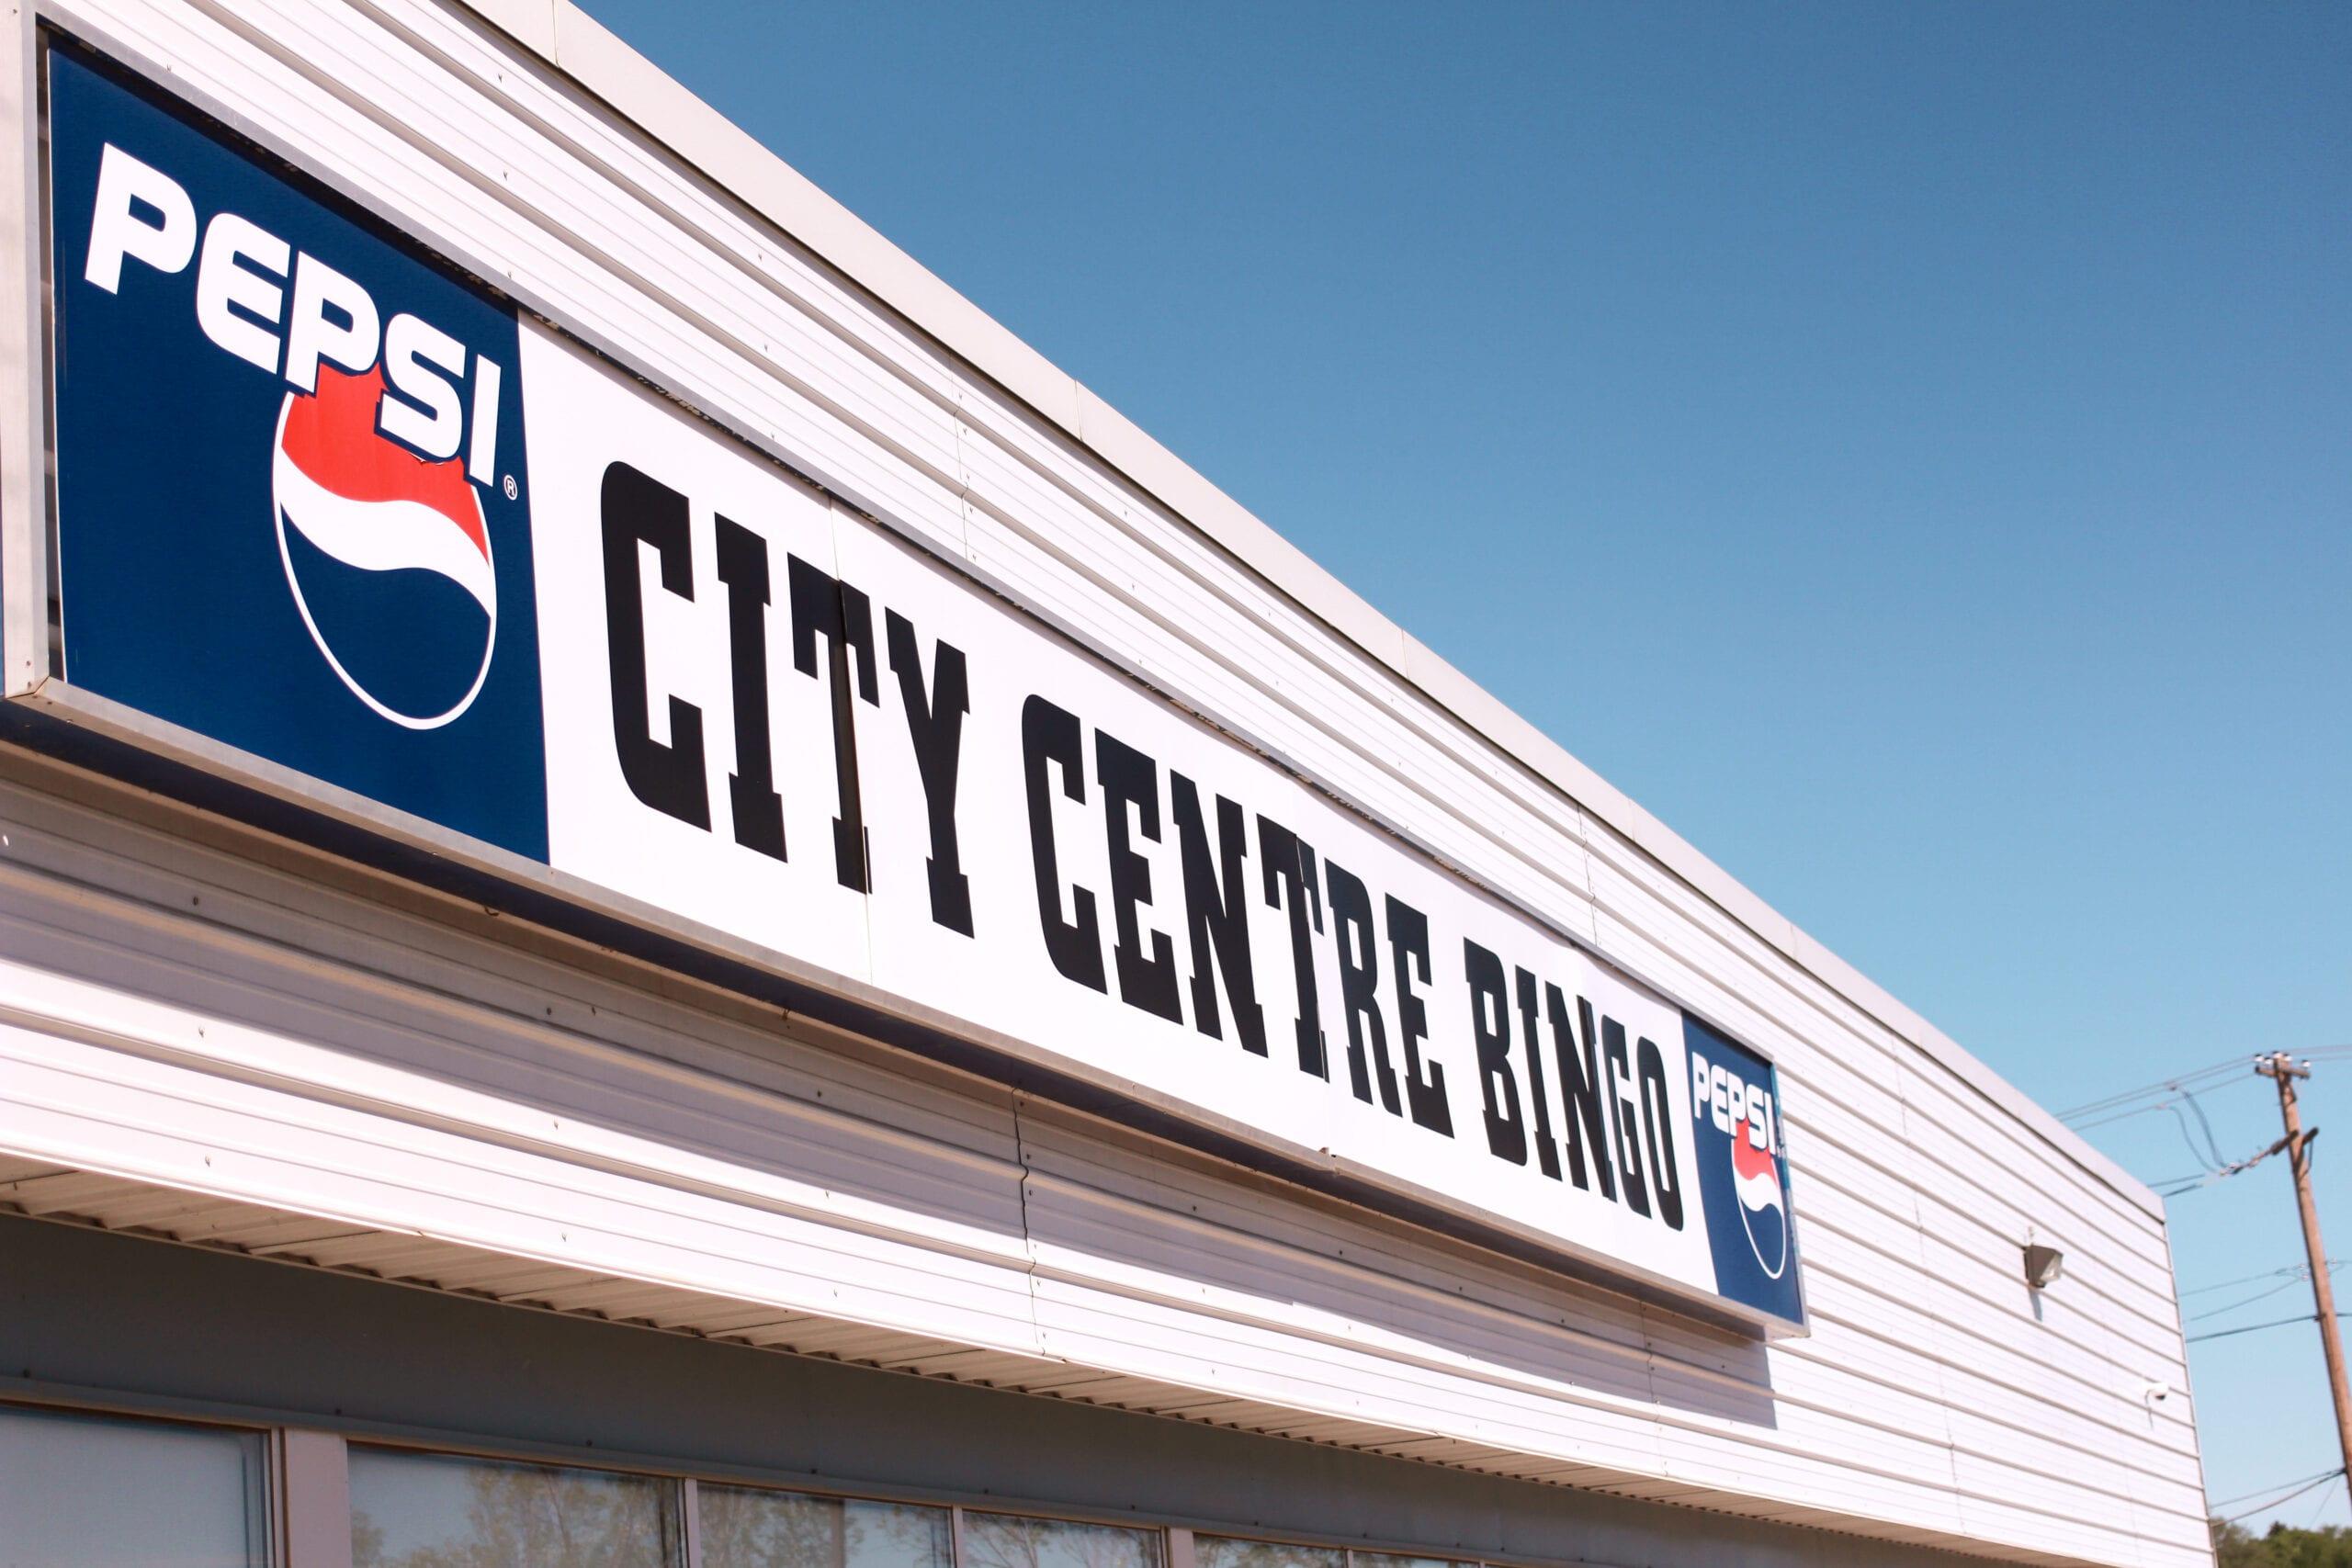 Front of City Centre Bingo